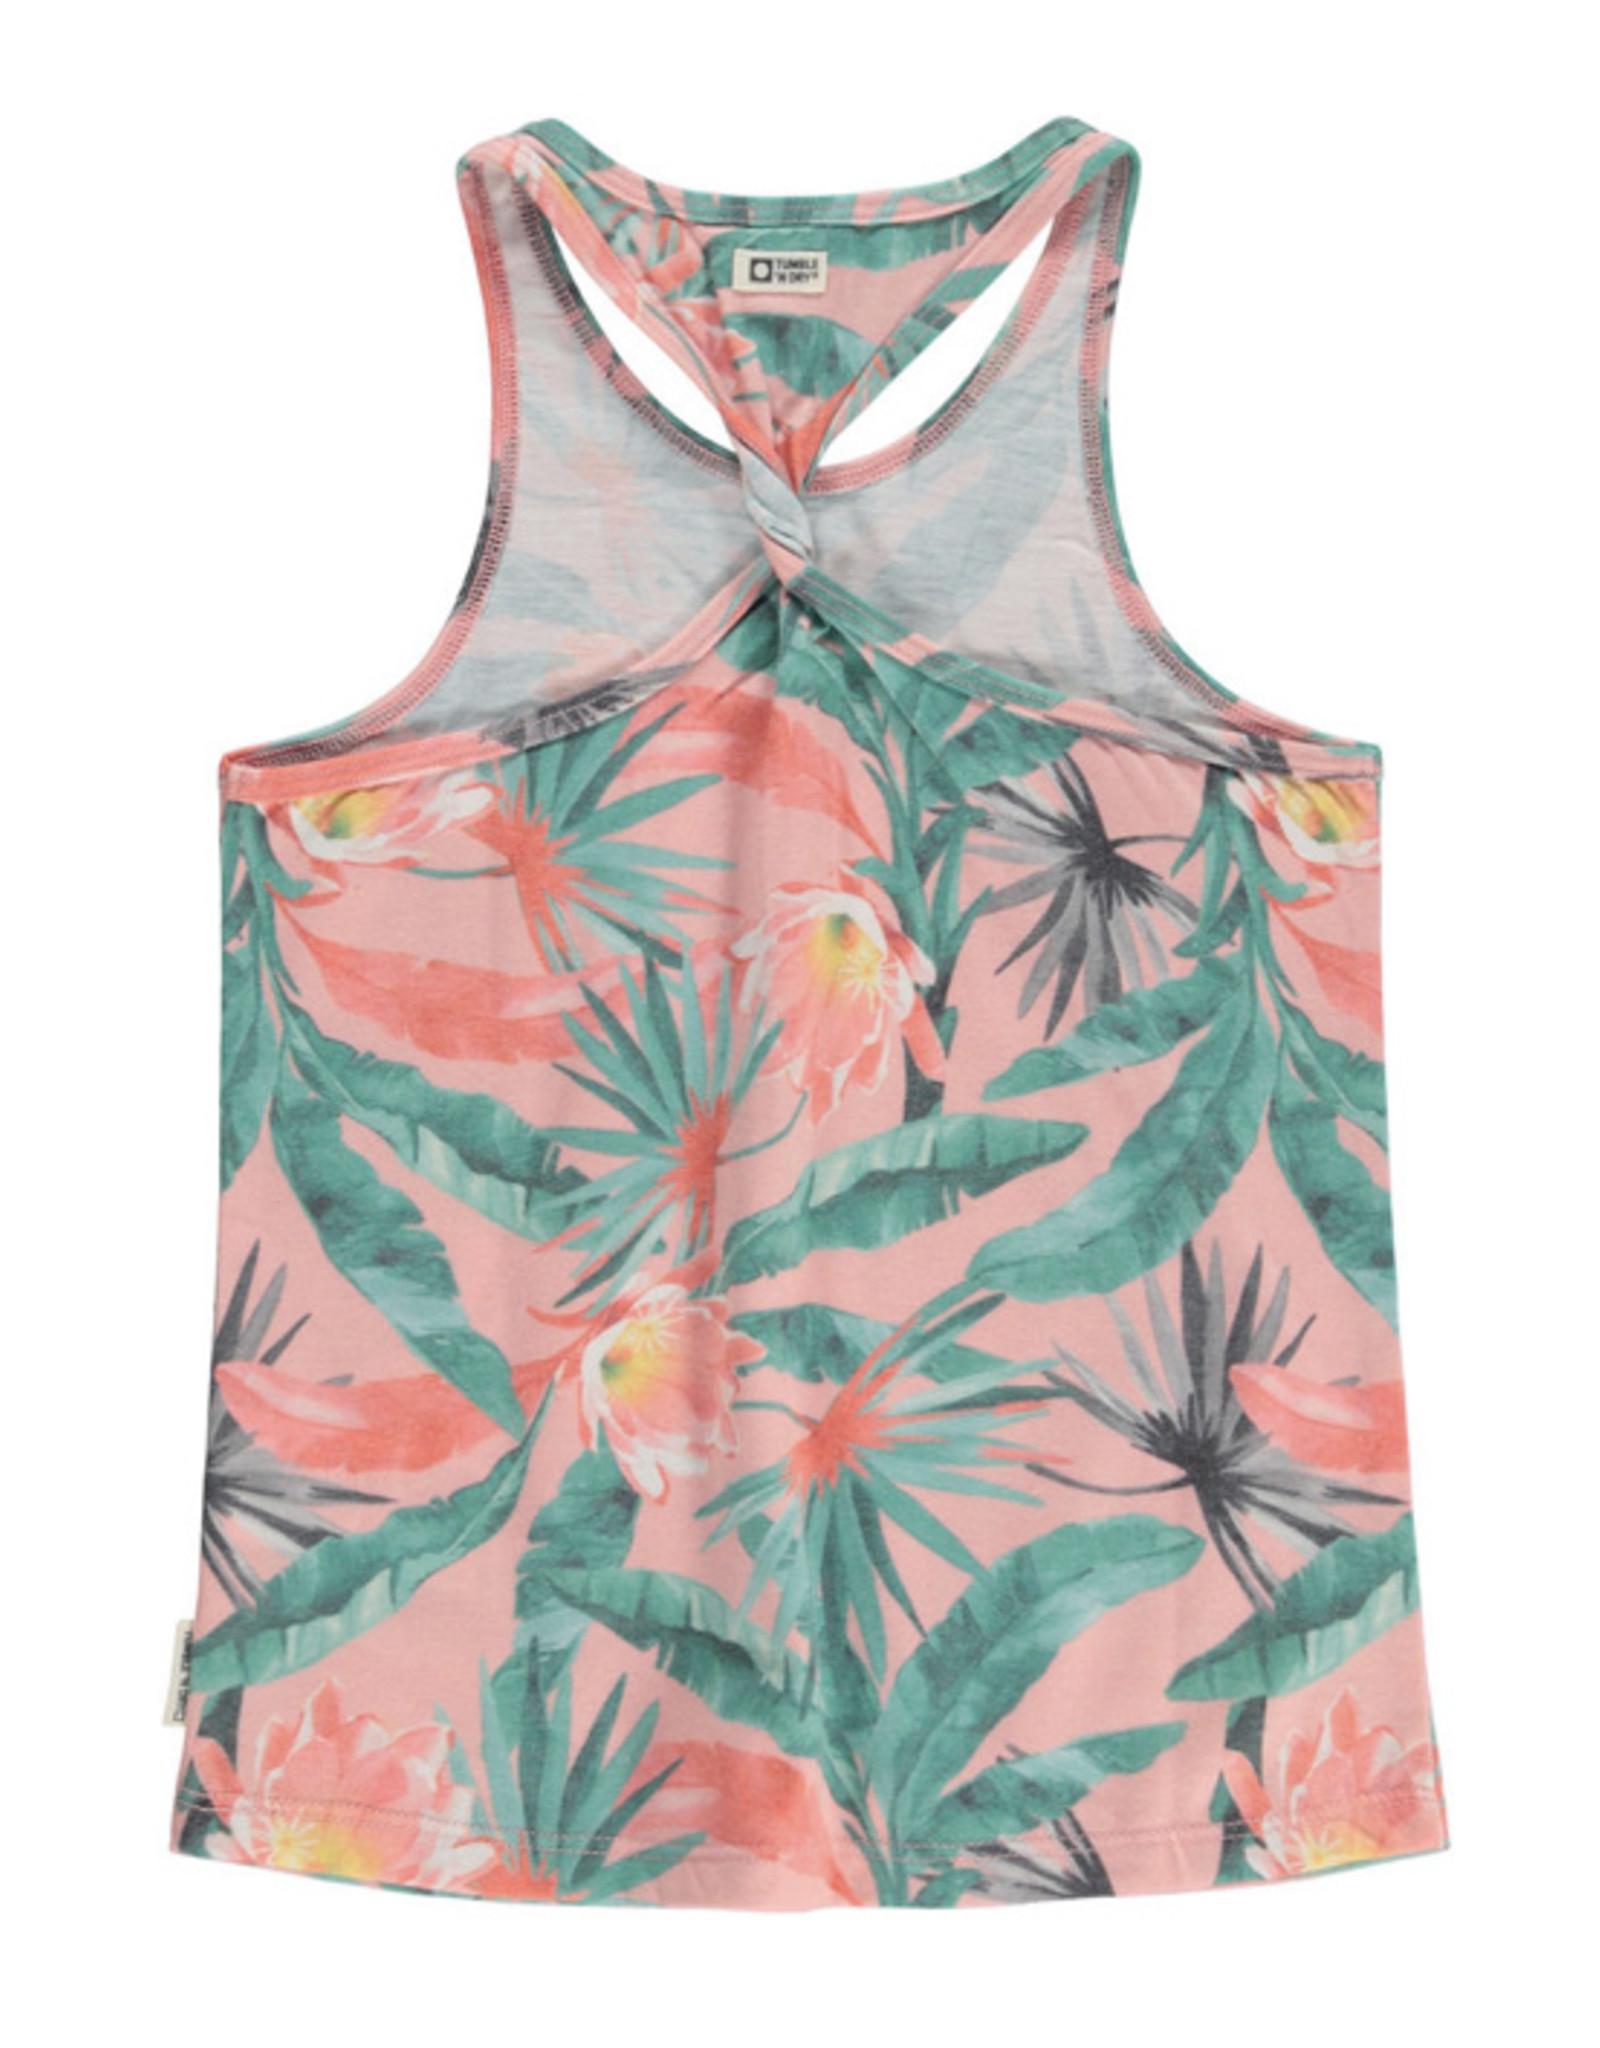 Tumble N Dry - Lesley Shirt